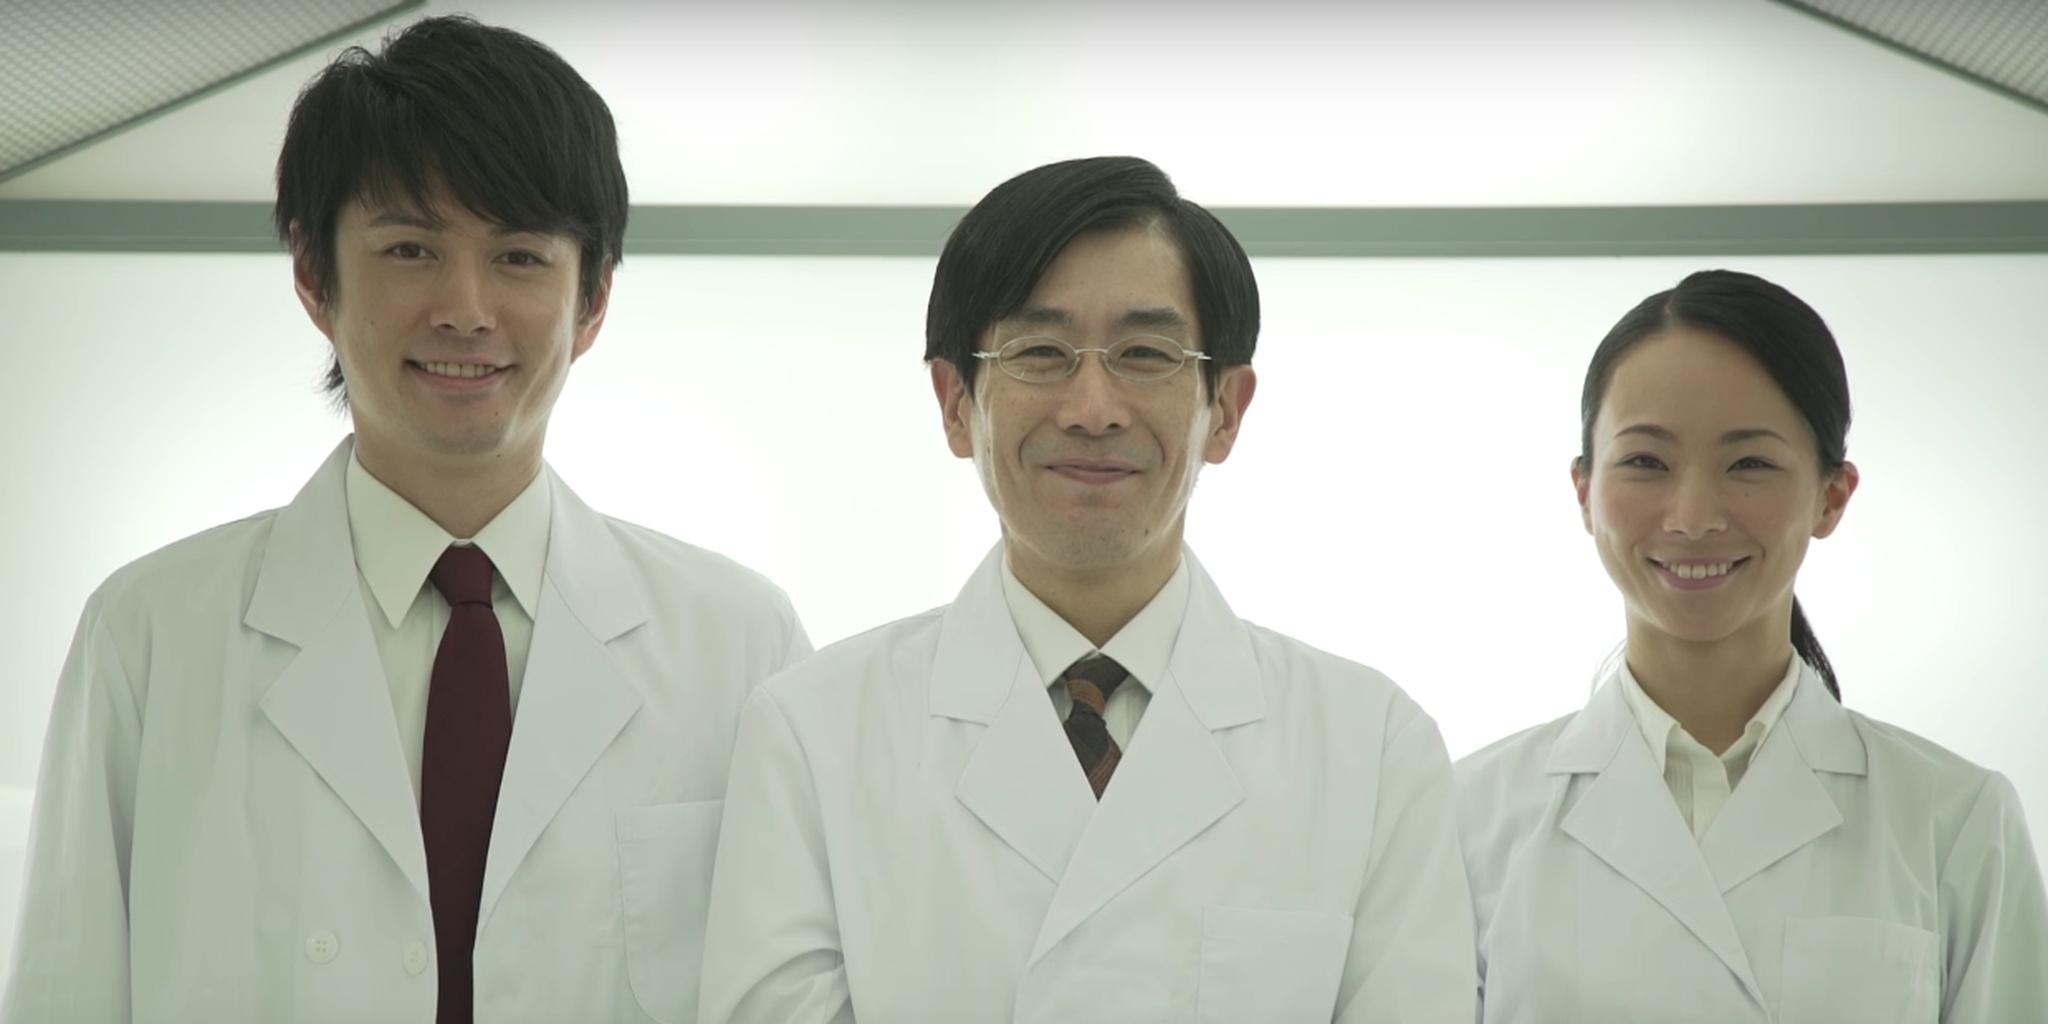 Japanese scientist